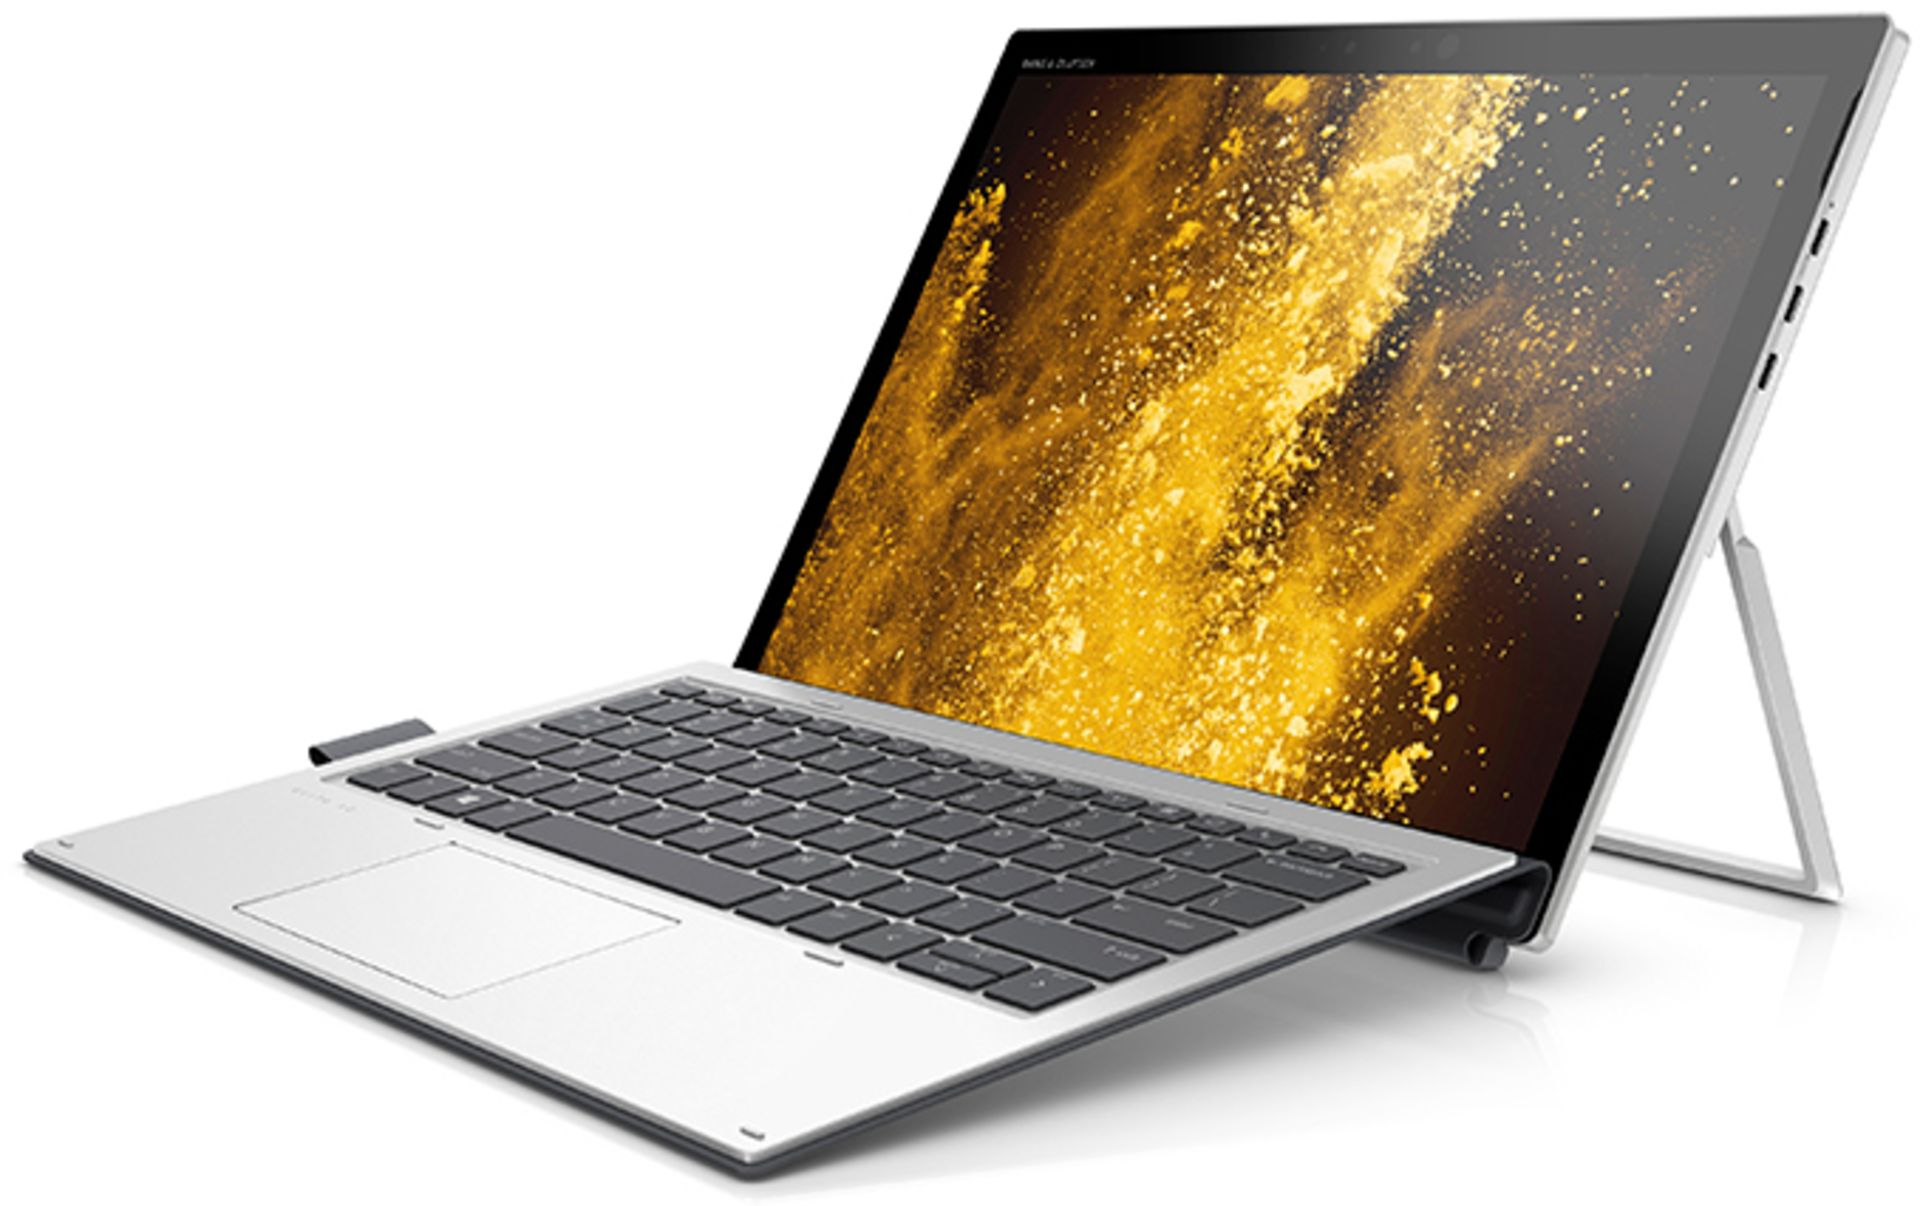 Lot 50040 - V Grade A HP Elite X2 1012 G1 Transformer Laptop & Tablet - Intel Core M7-6Y75 CPU 1.2Ghz - 8GB